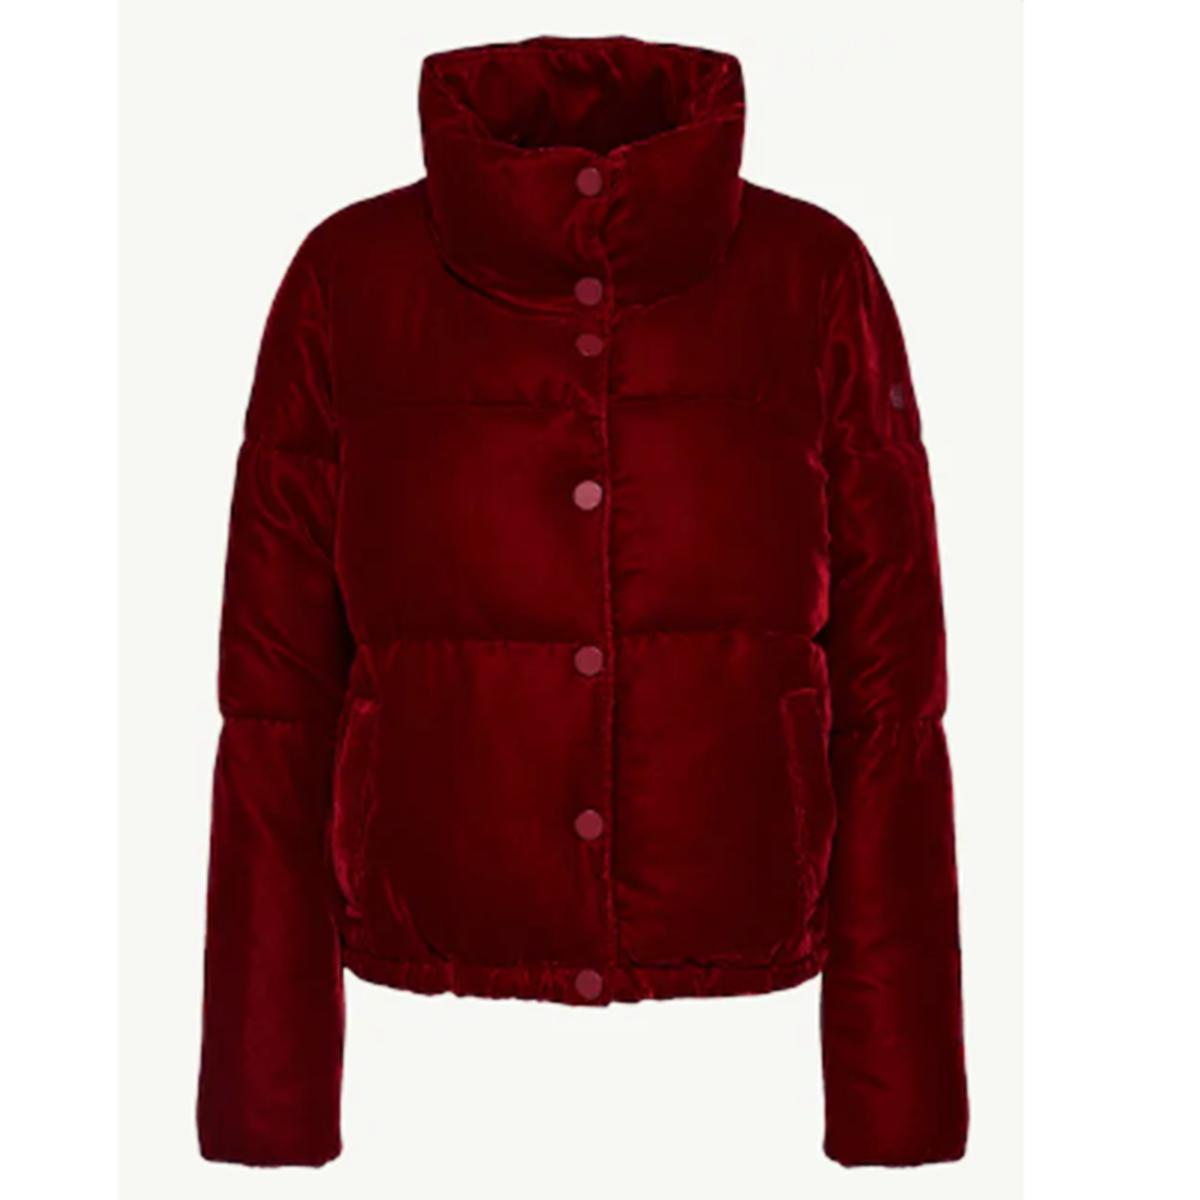 One Puffer Jacket, Three Ways